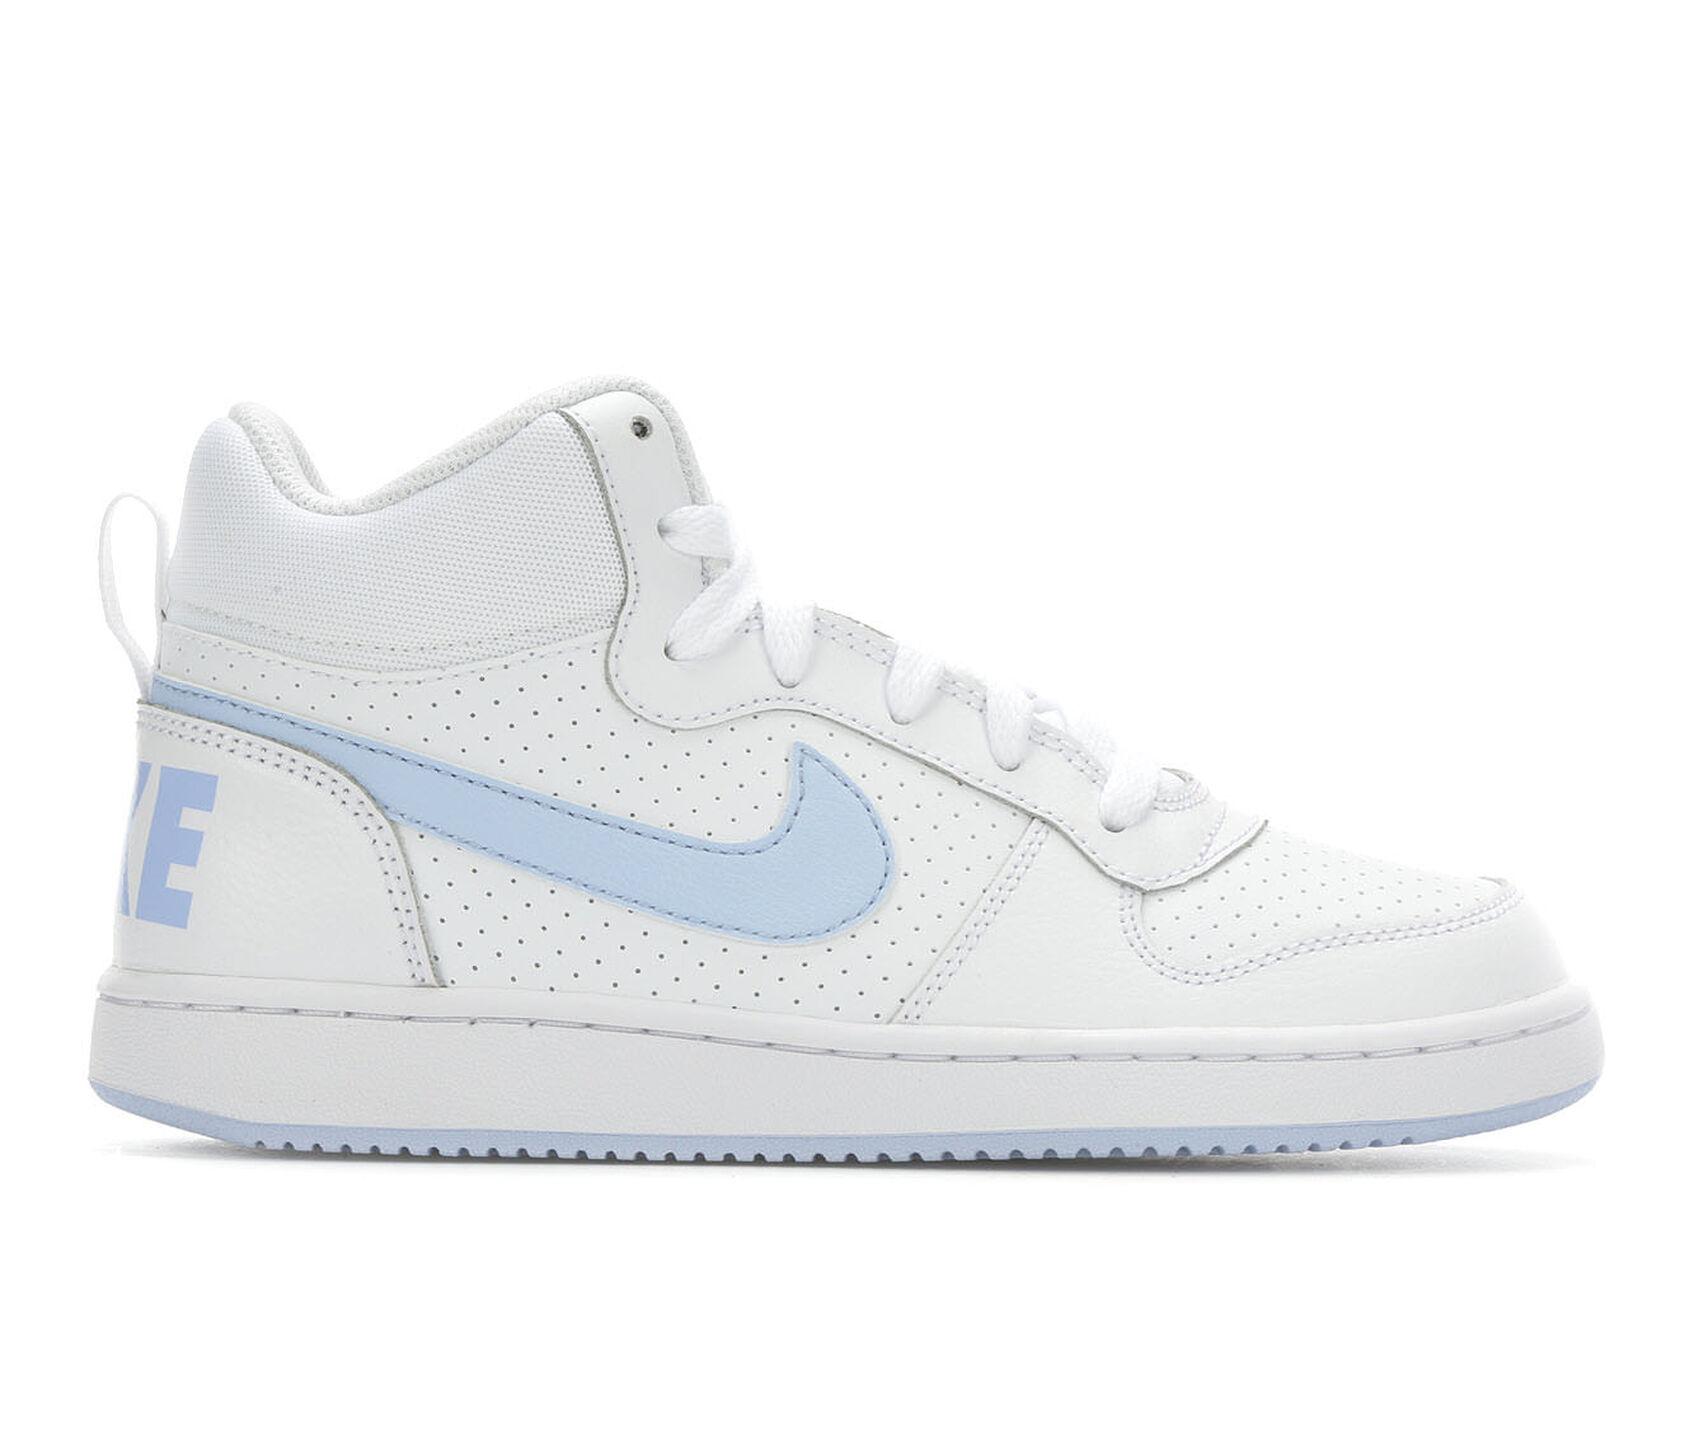 pretty nice 6b7c7 e1016 ... Nike Big Kid Court Borough Mid Basketball Shoes. Previous